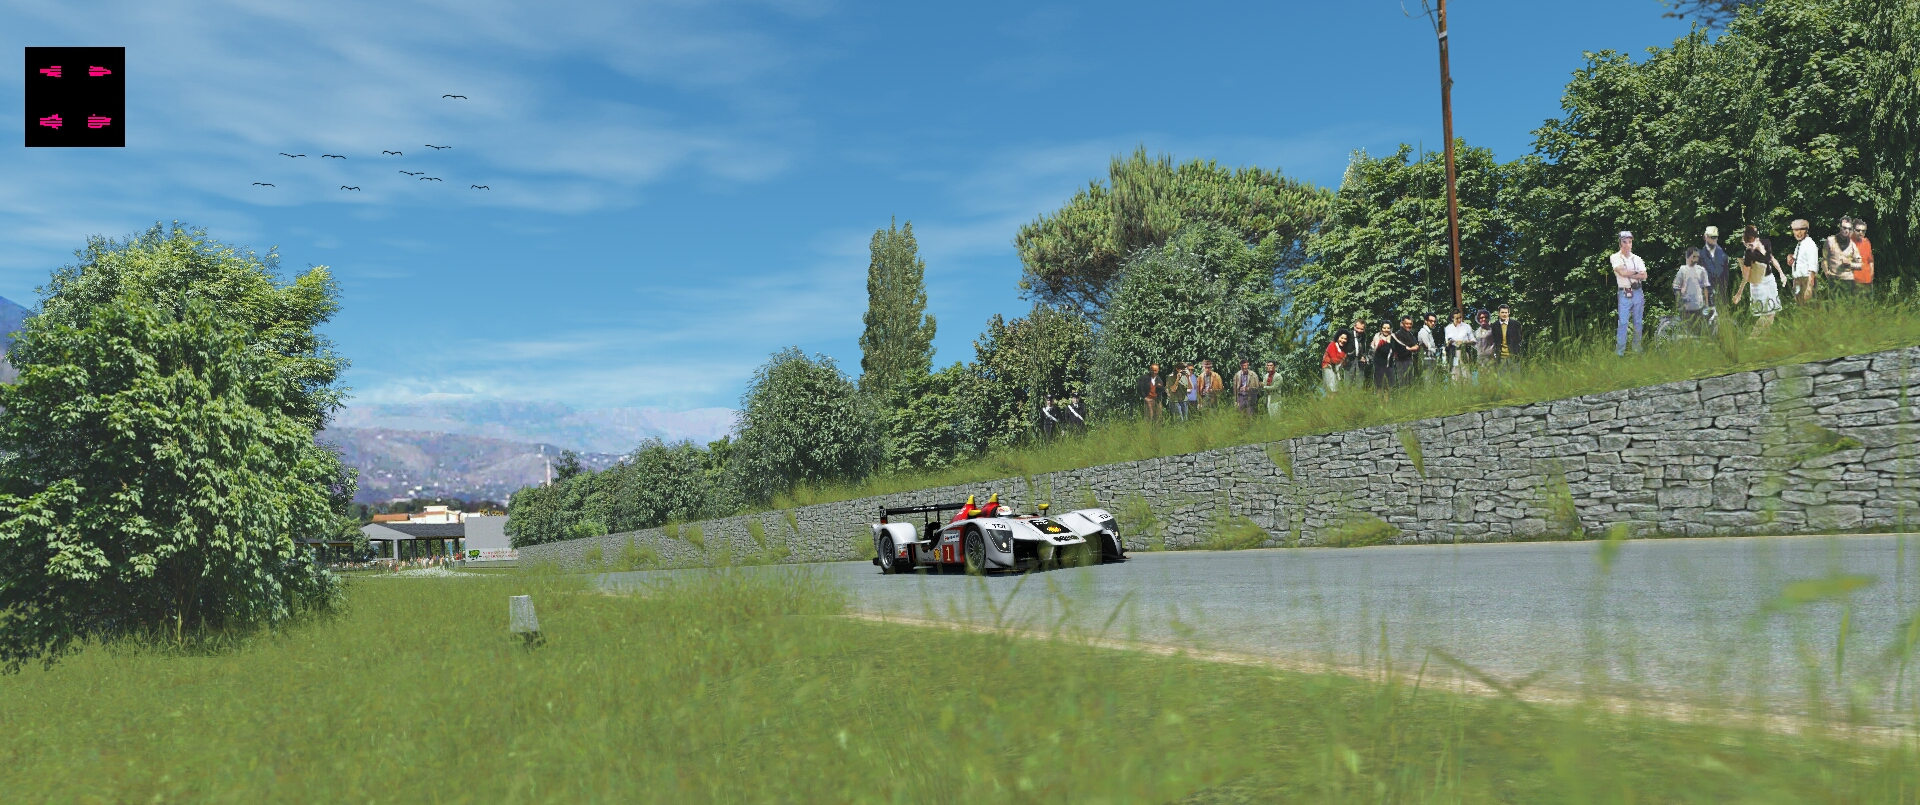 365960_20201216150146_1 Targa Florio 0.28 for rFactor 2 – Released